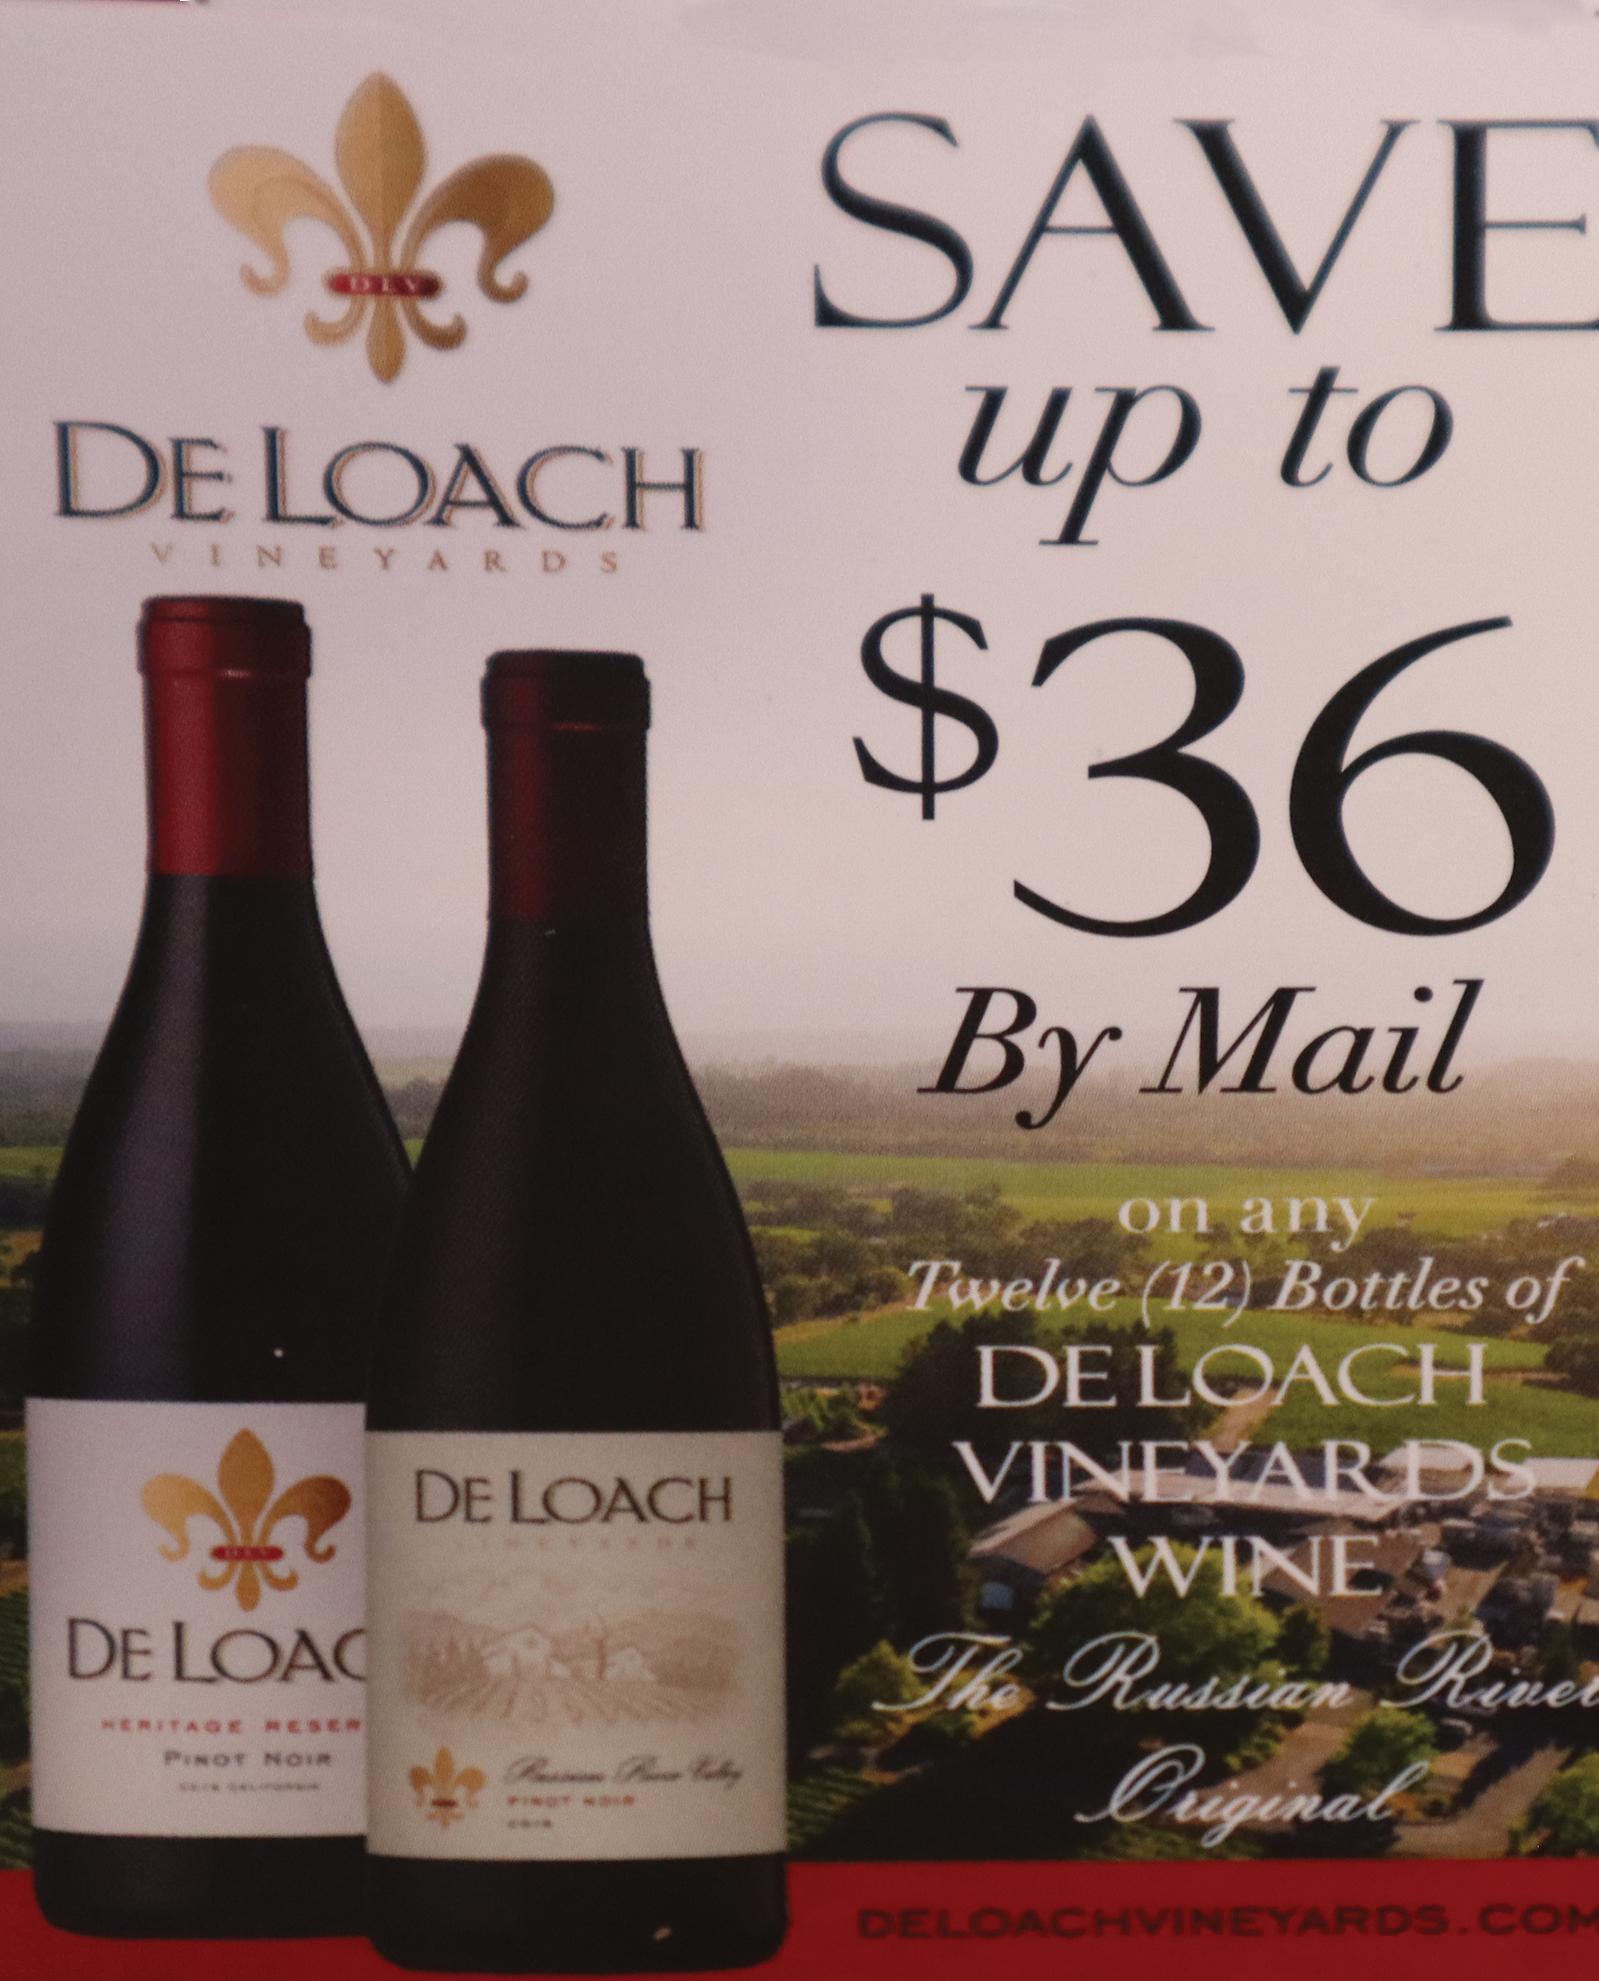 De Loach Vineyards